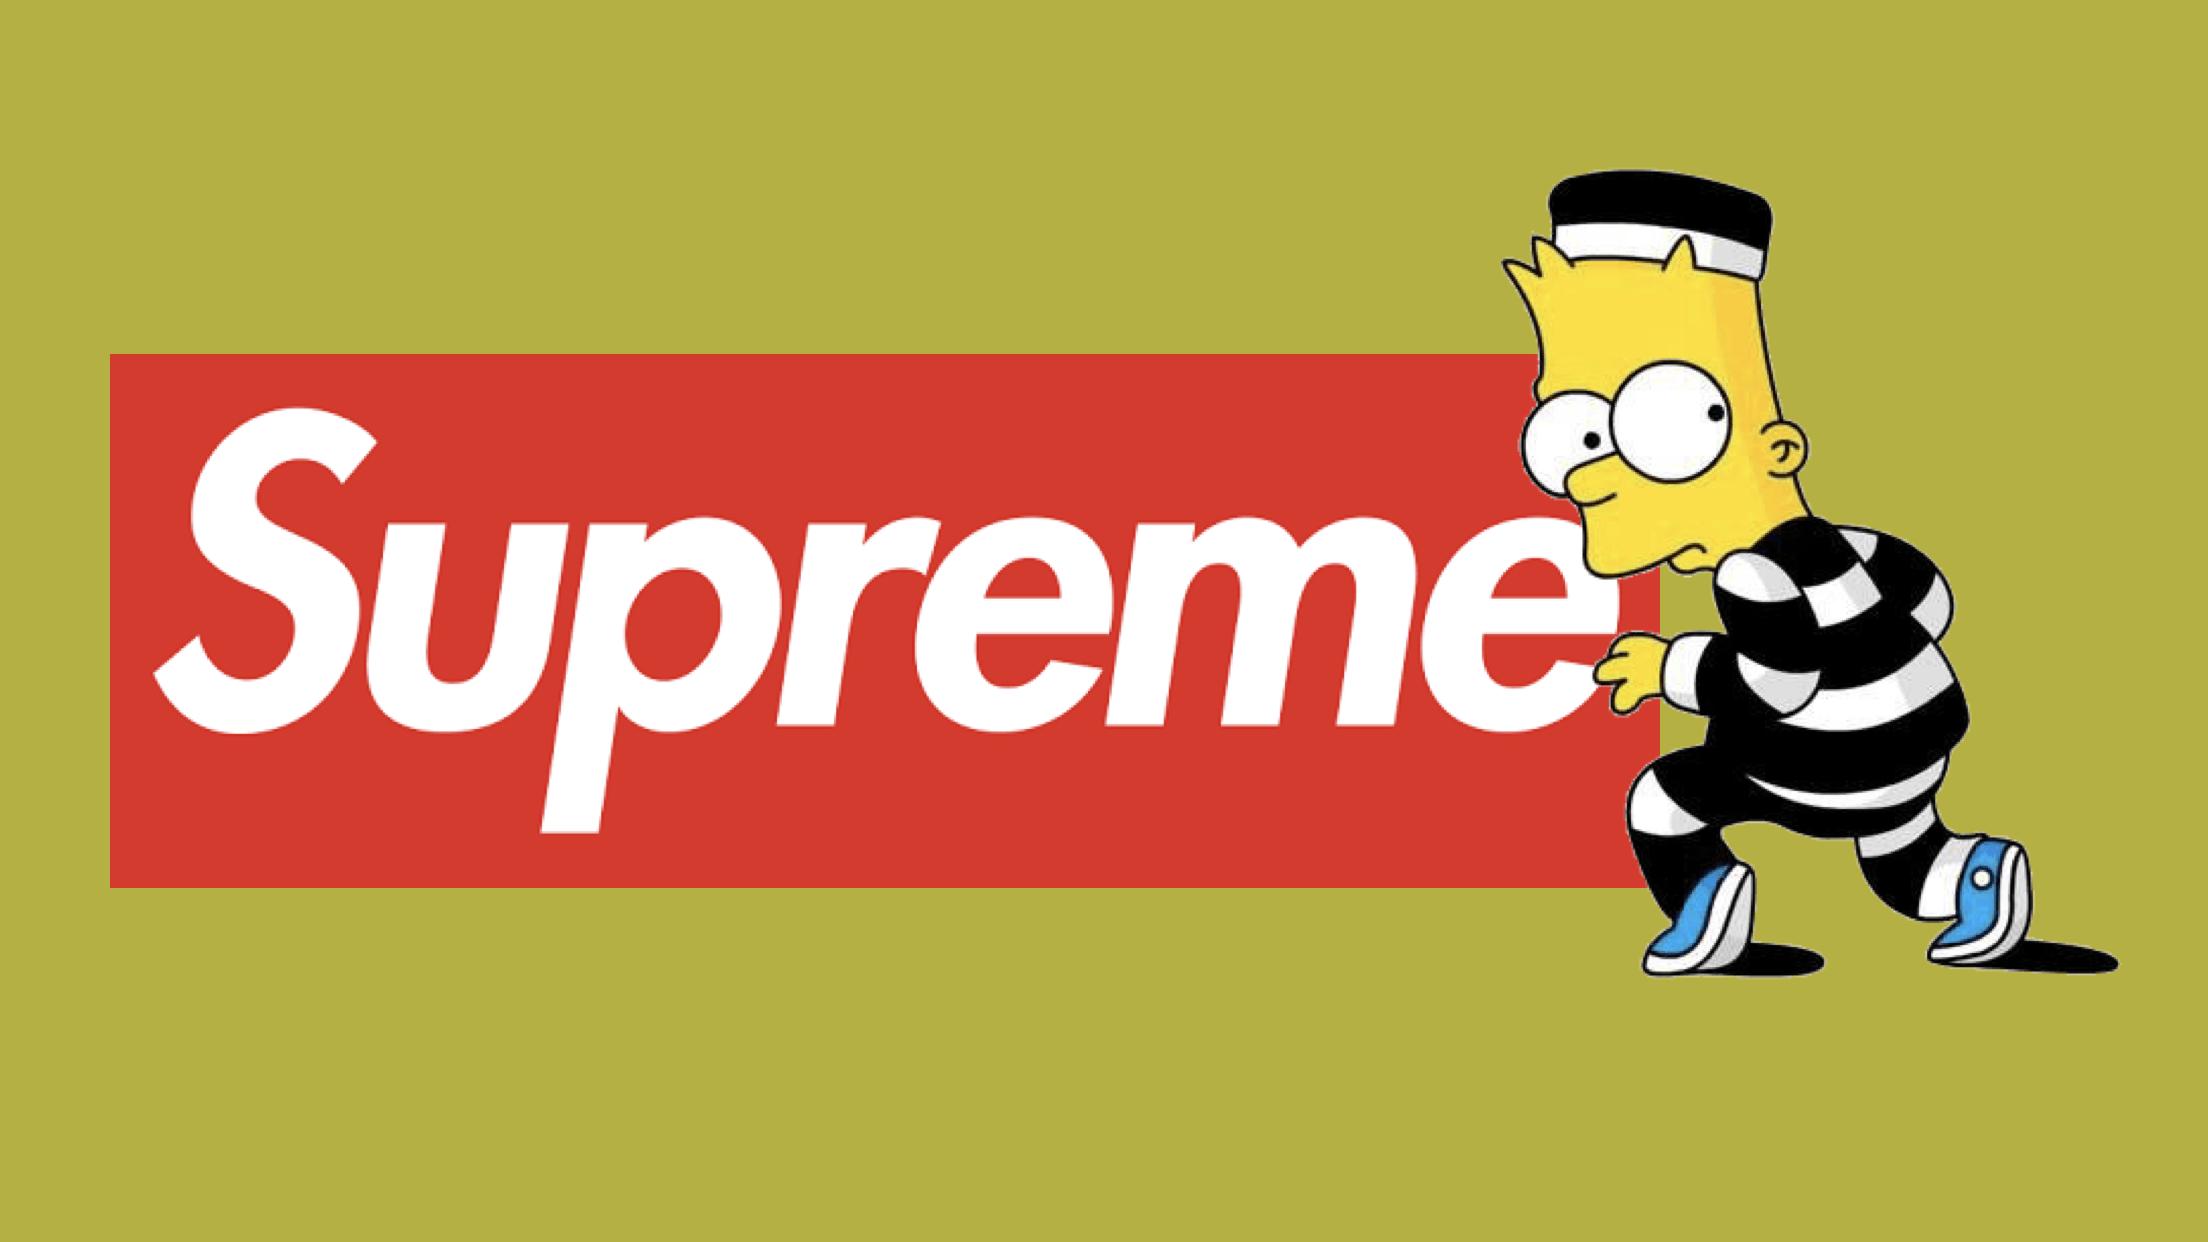 Supreme Simpsons Computer Wallpapers - Wallpaper Cave